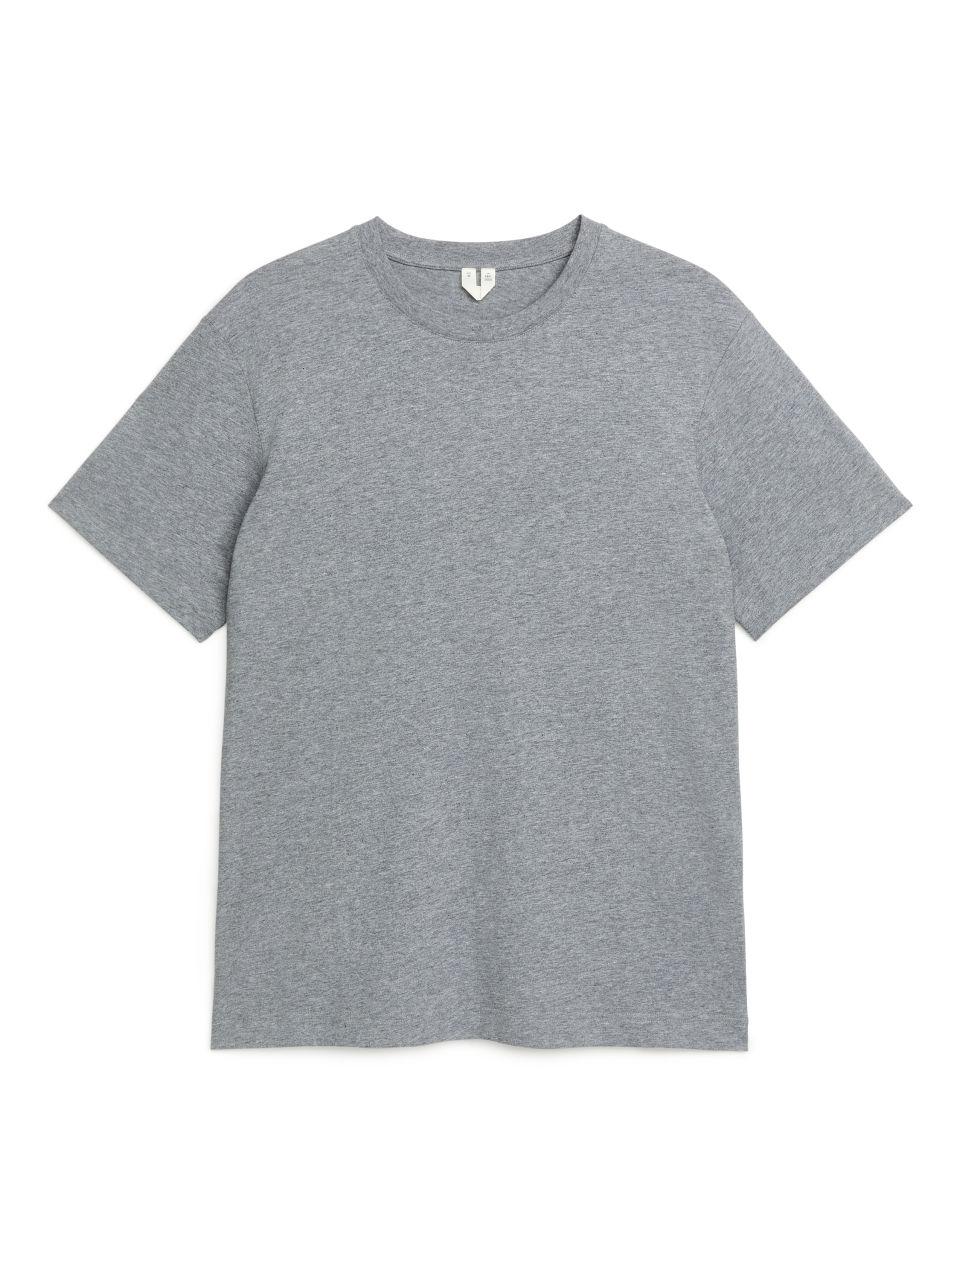 Midweight T-Shirt - Grey